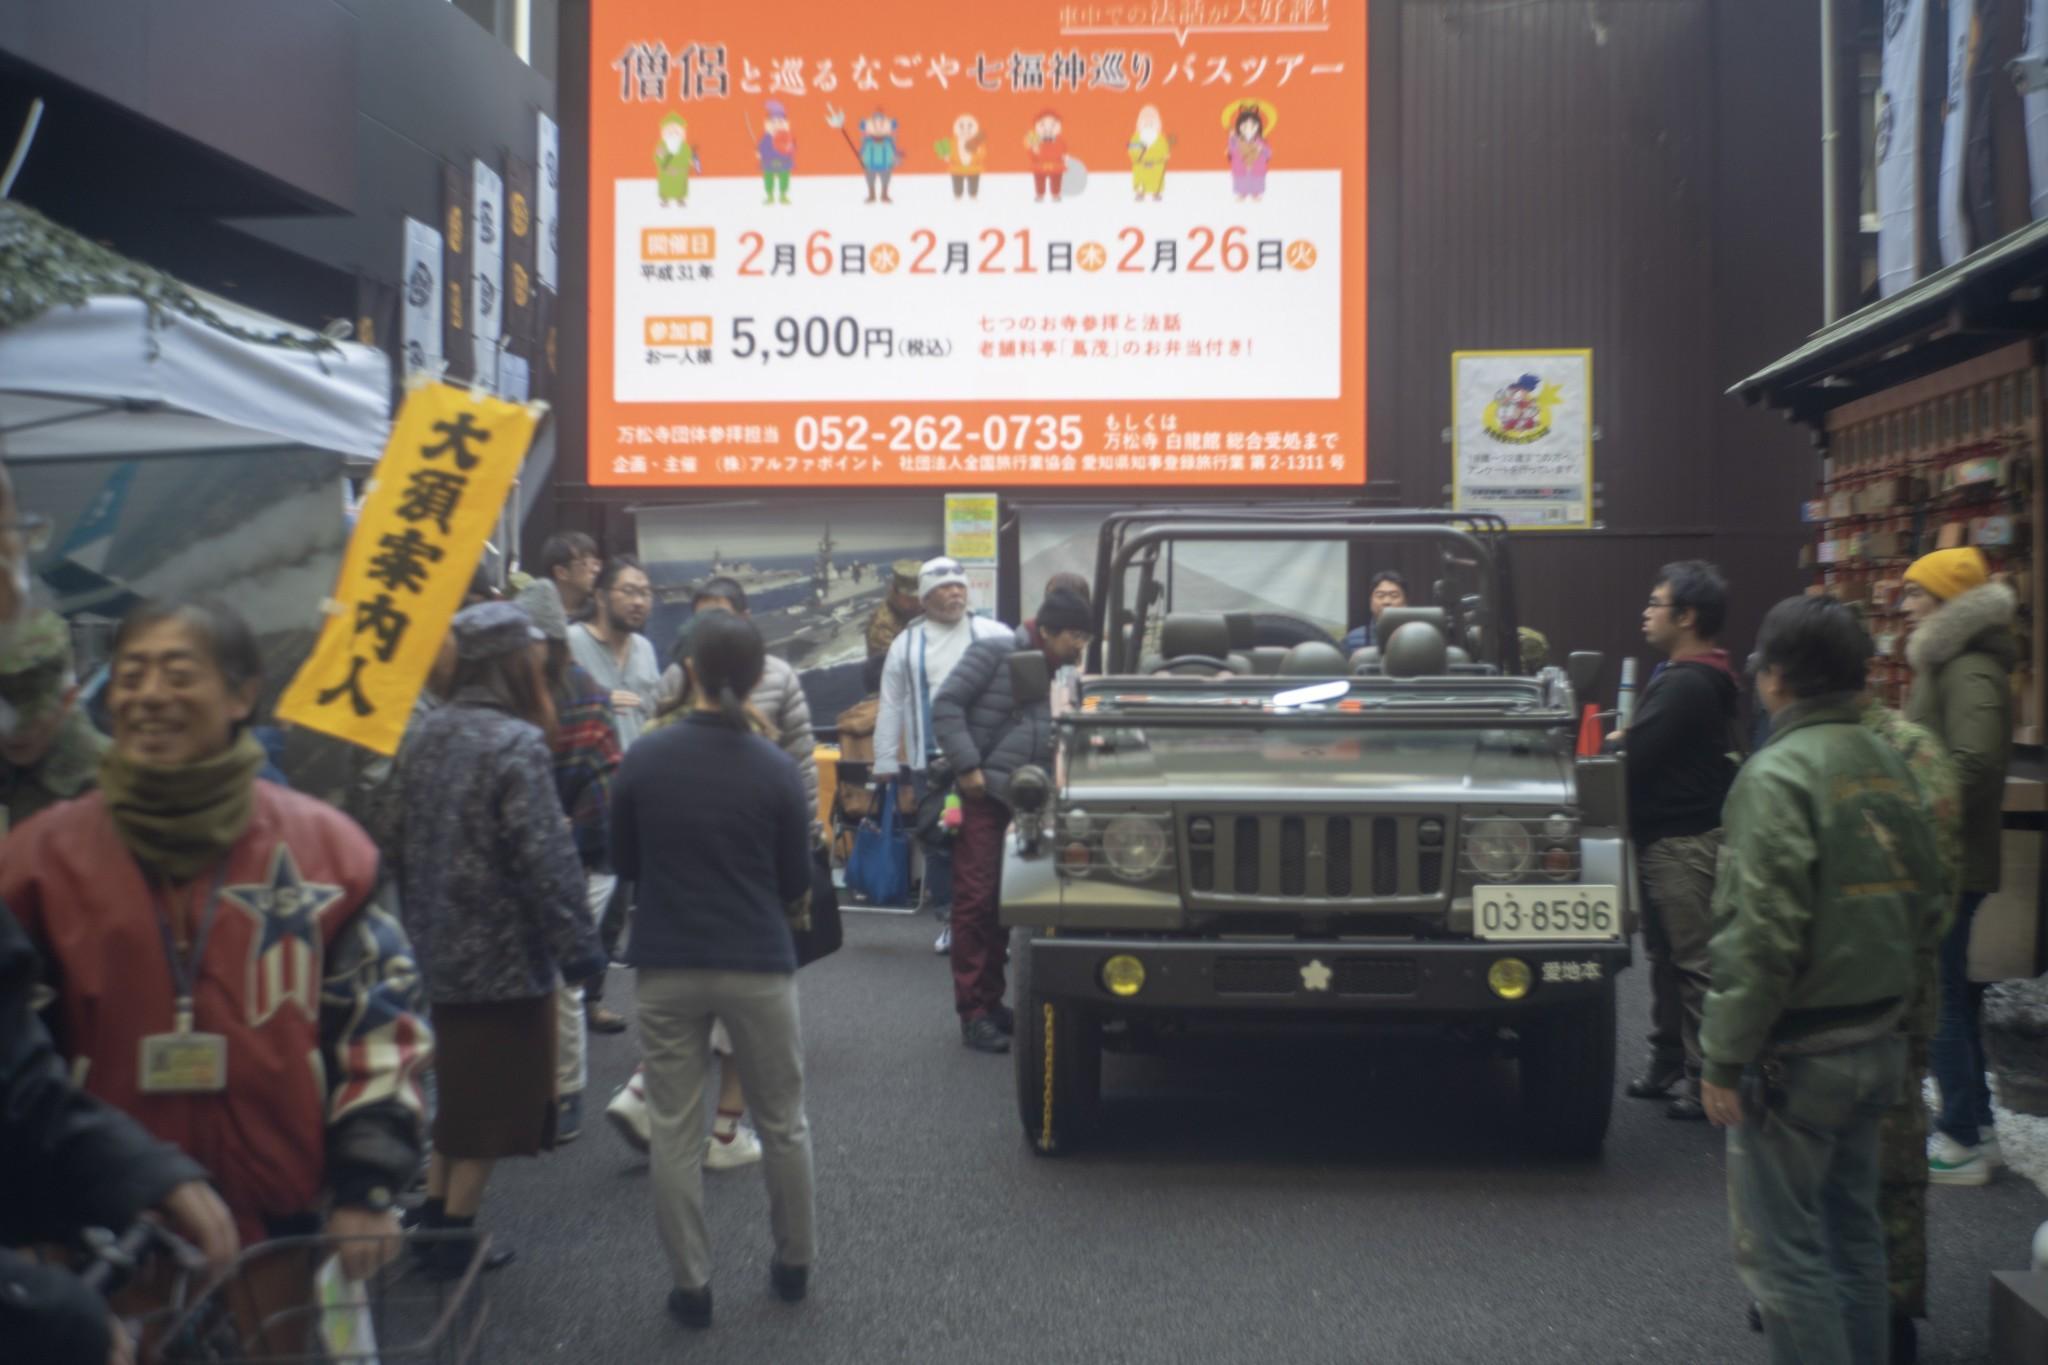 Lomo SMENA8M T43 40mm F4